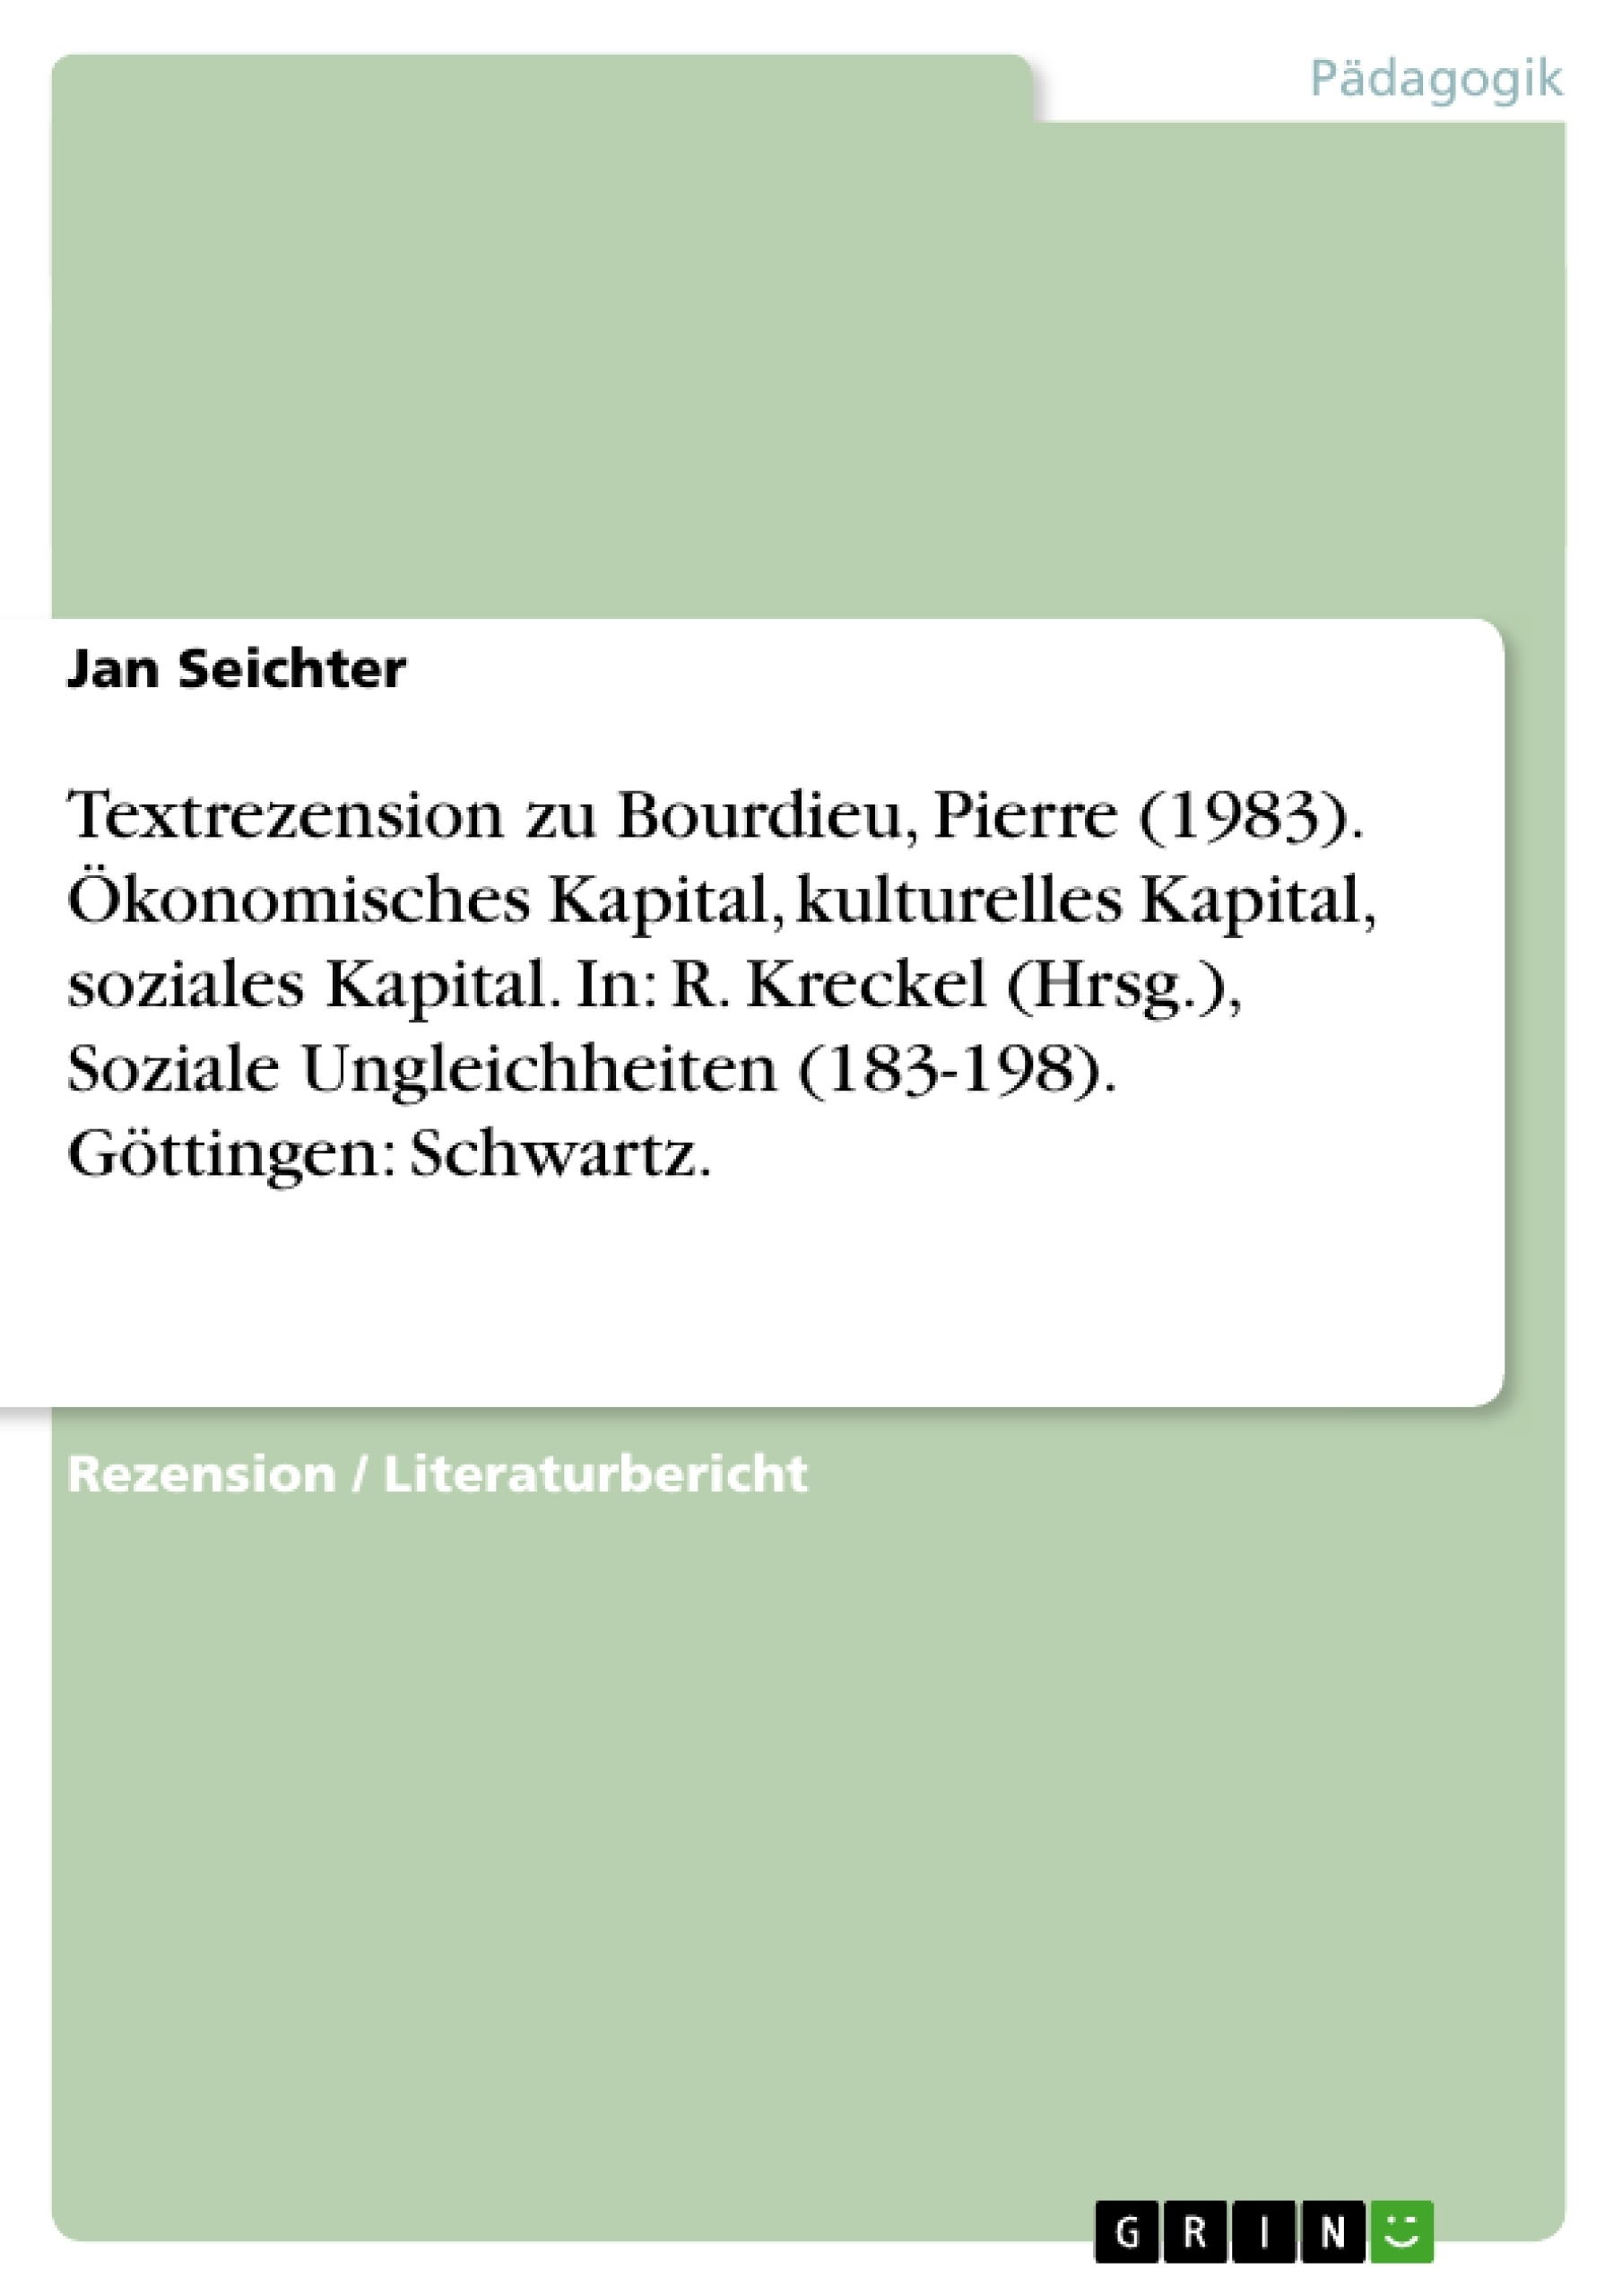 Titel: Textrezension zu Bourdieu, Pierre (1983). Ökonomisches Kapital, kulturelles Kapital, soziales Kapital. In: R. Kreckel (Hrsg.), Soziale Ungleichheiten (183-198). Göttingen: Schwartz.